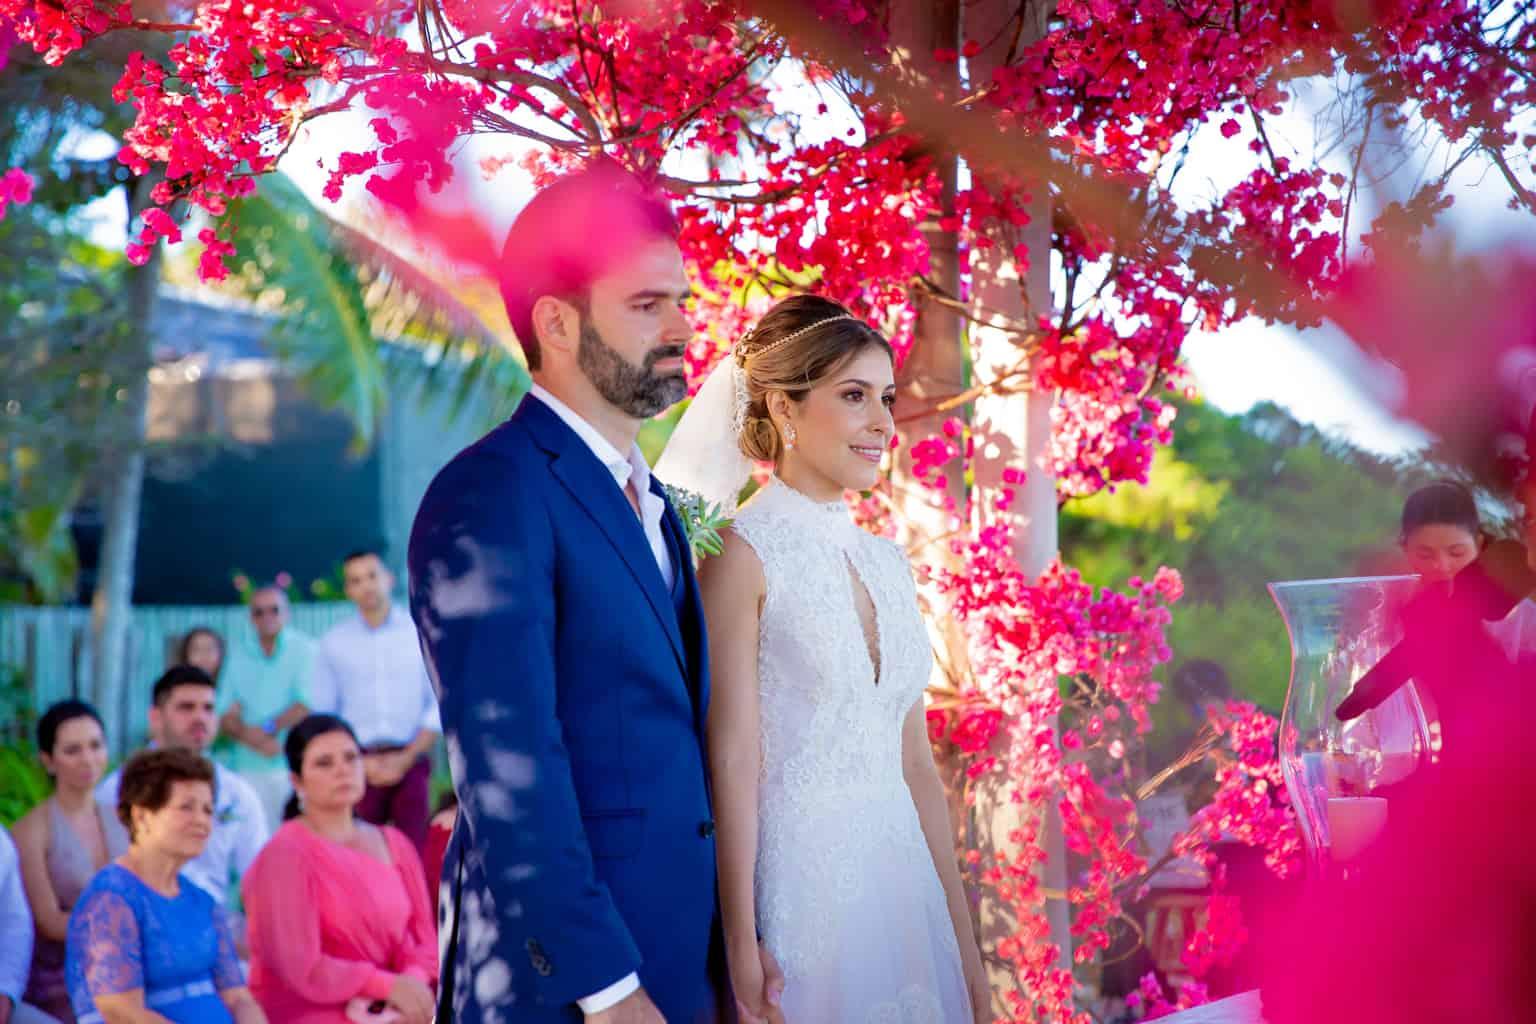 casamento-Taina-e-Hugo-Itapororoca-Villa-Trancoso-Patricia-Galvao-Sotter-Fotografia-Cerimonia-na-praia632